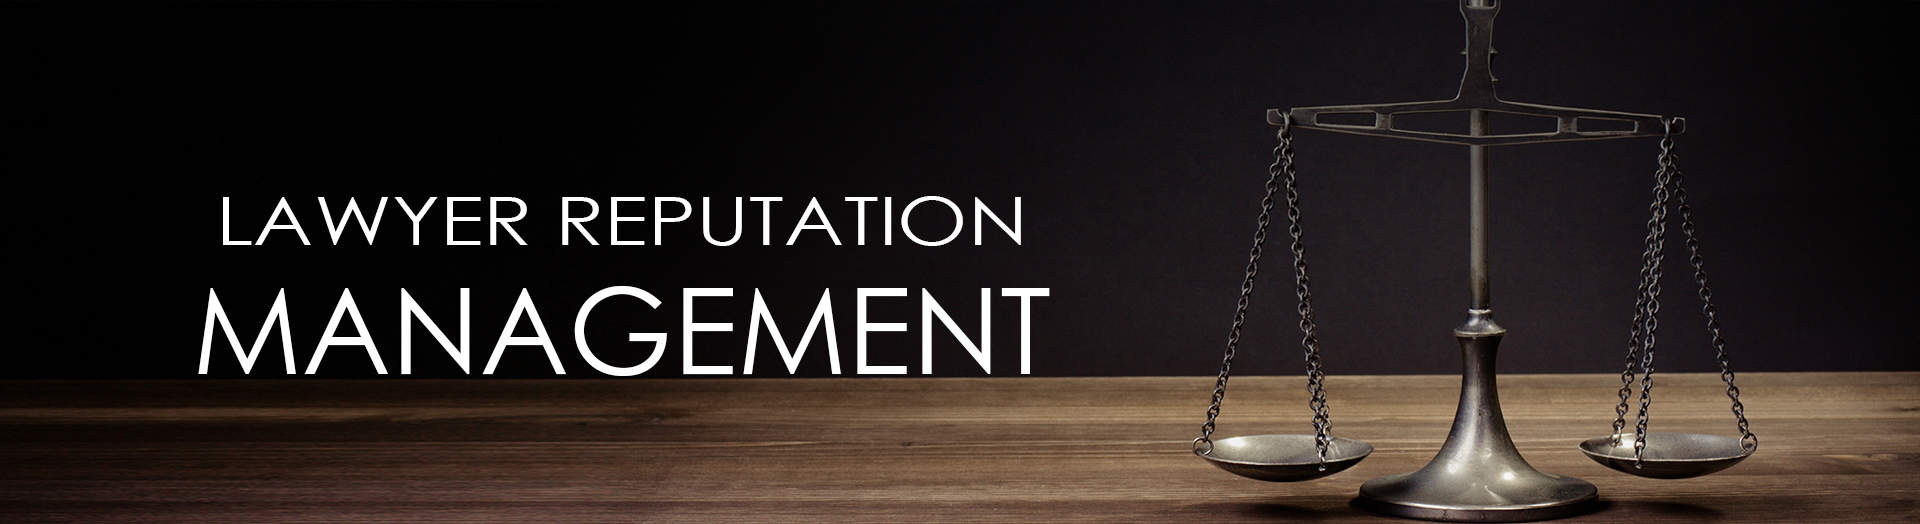 Lawyer Reputation Management Services